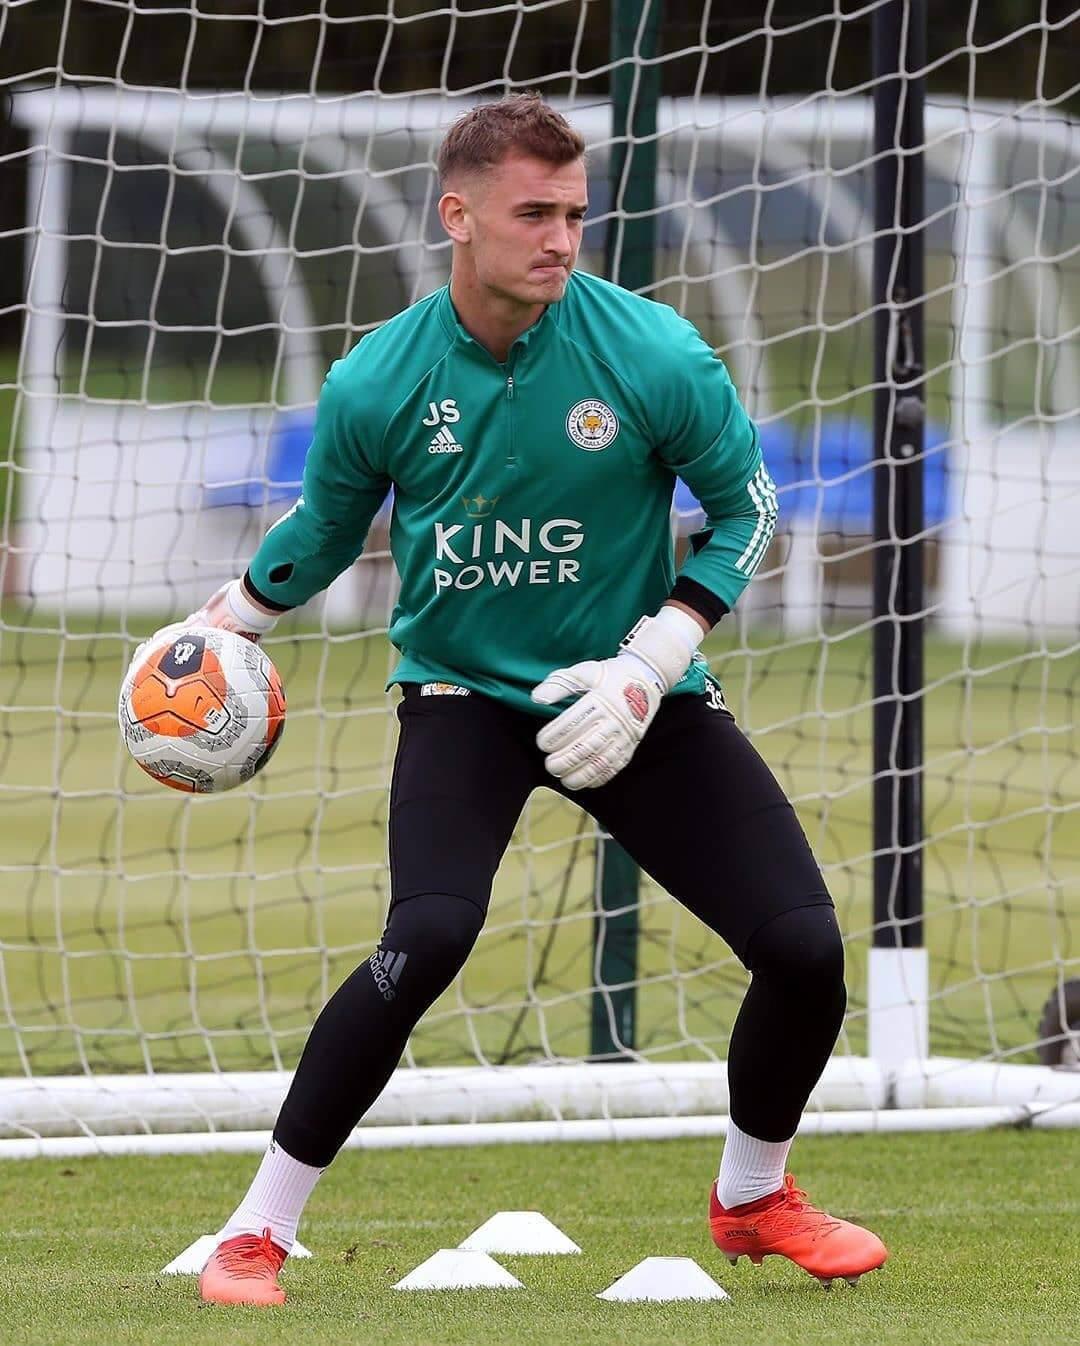 Jakub_Stolarczyk_-_Leicester_City2.jpg